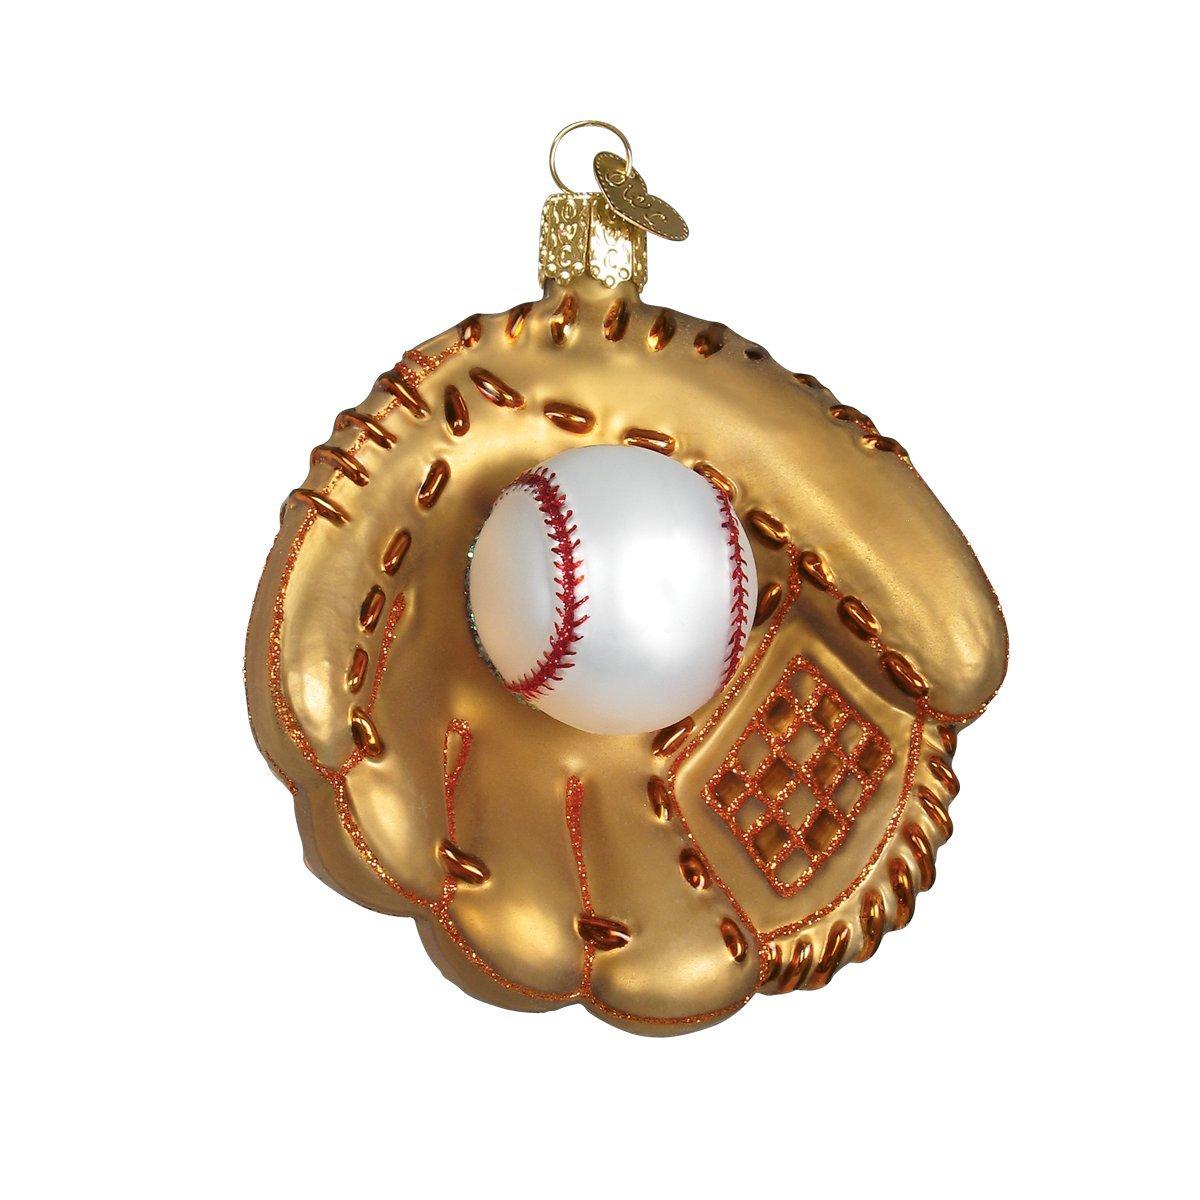 Old World Christmas Ornaments: Baseball Mitt Glass Blown Ornaments for Christmas Tree (44027)